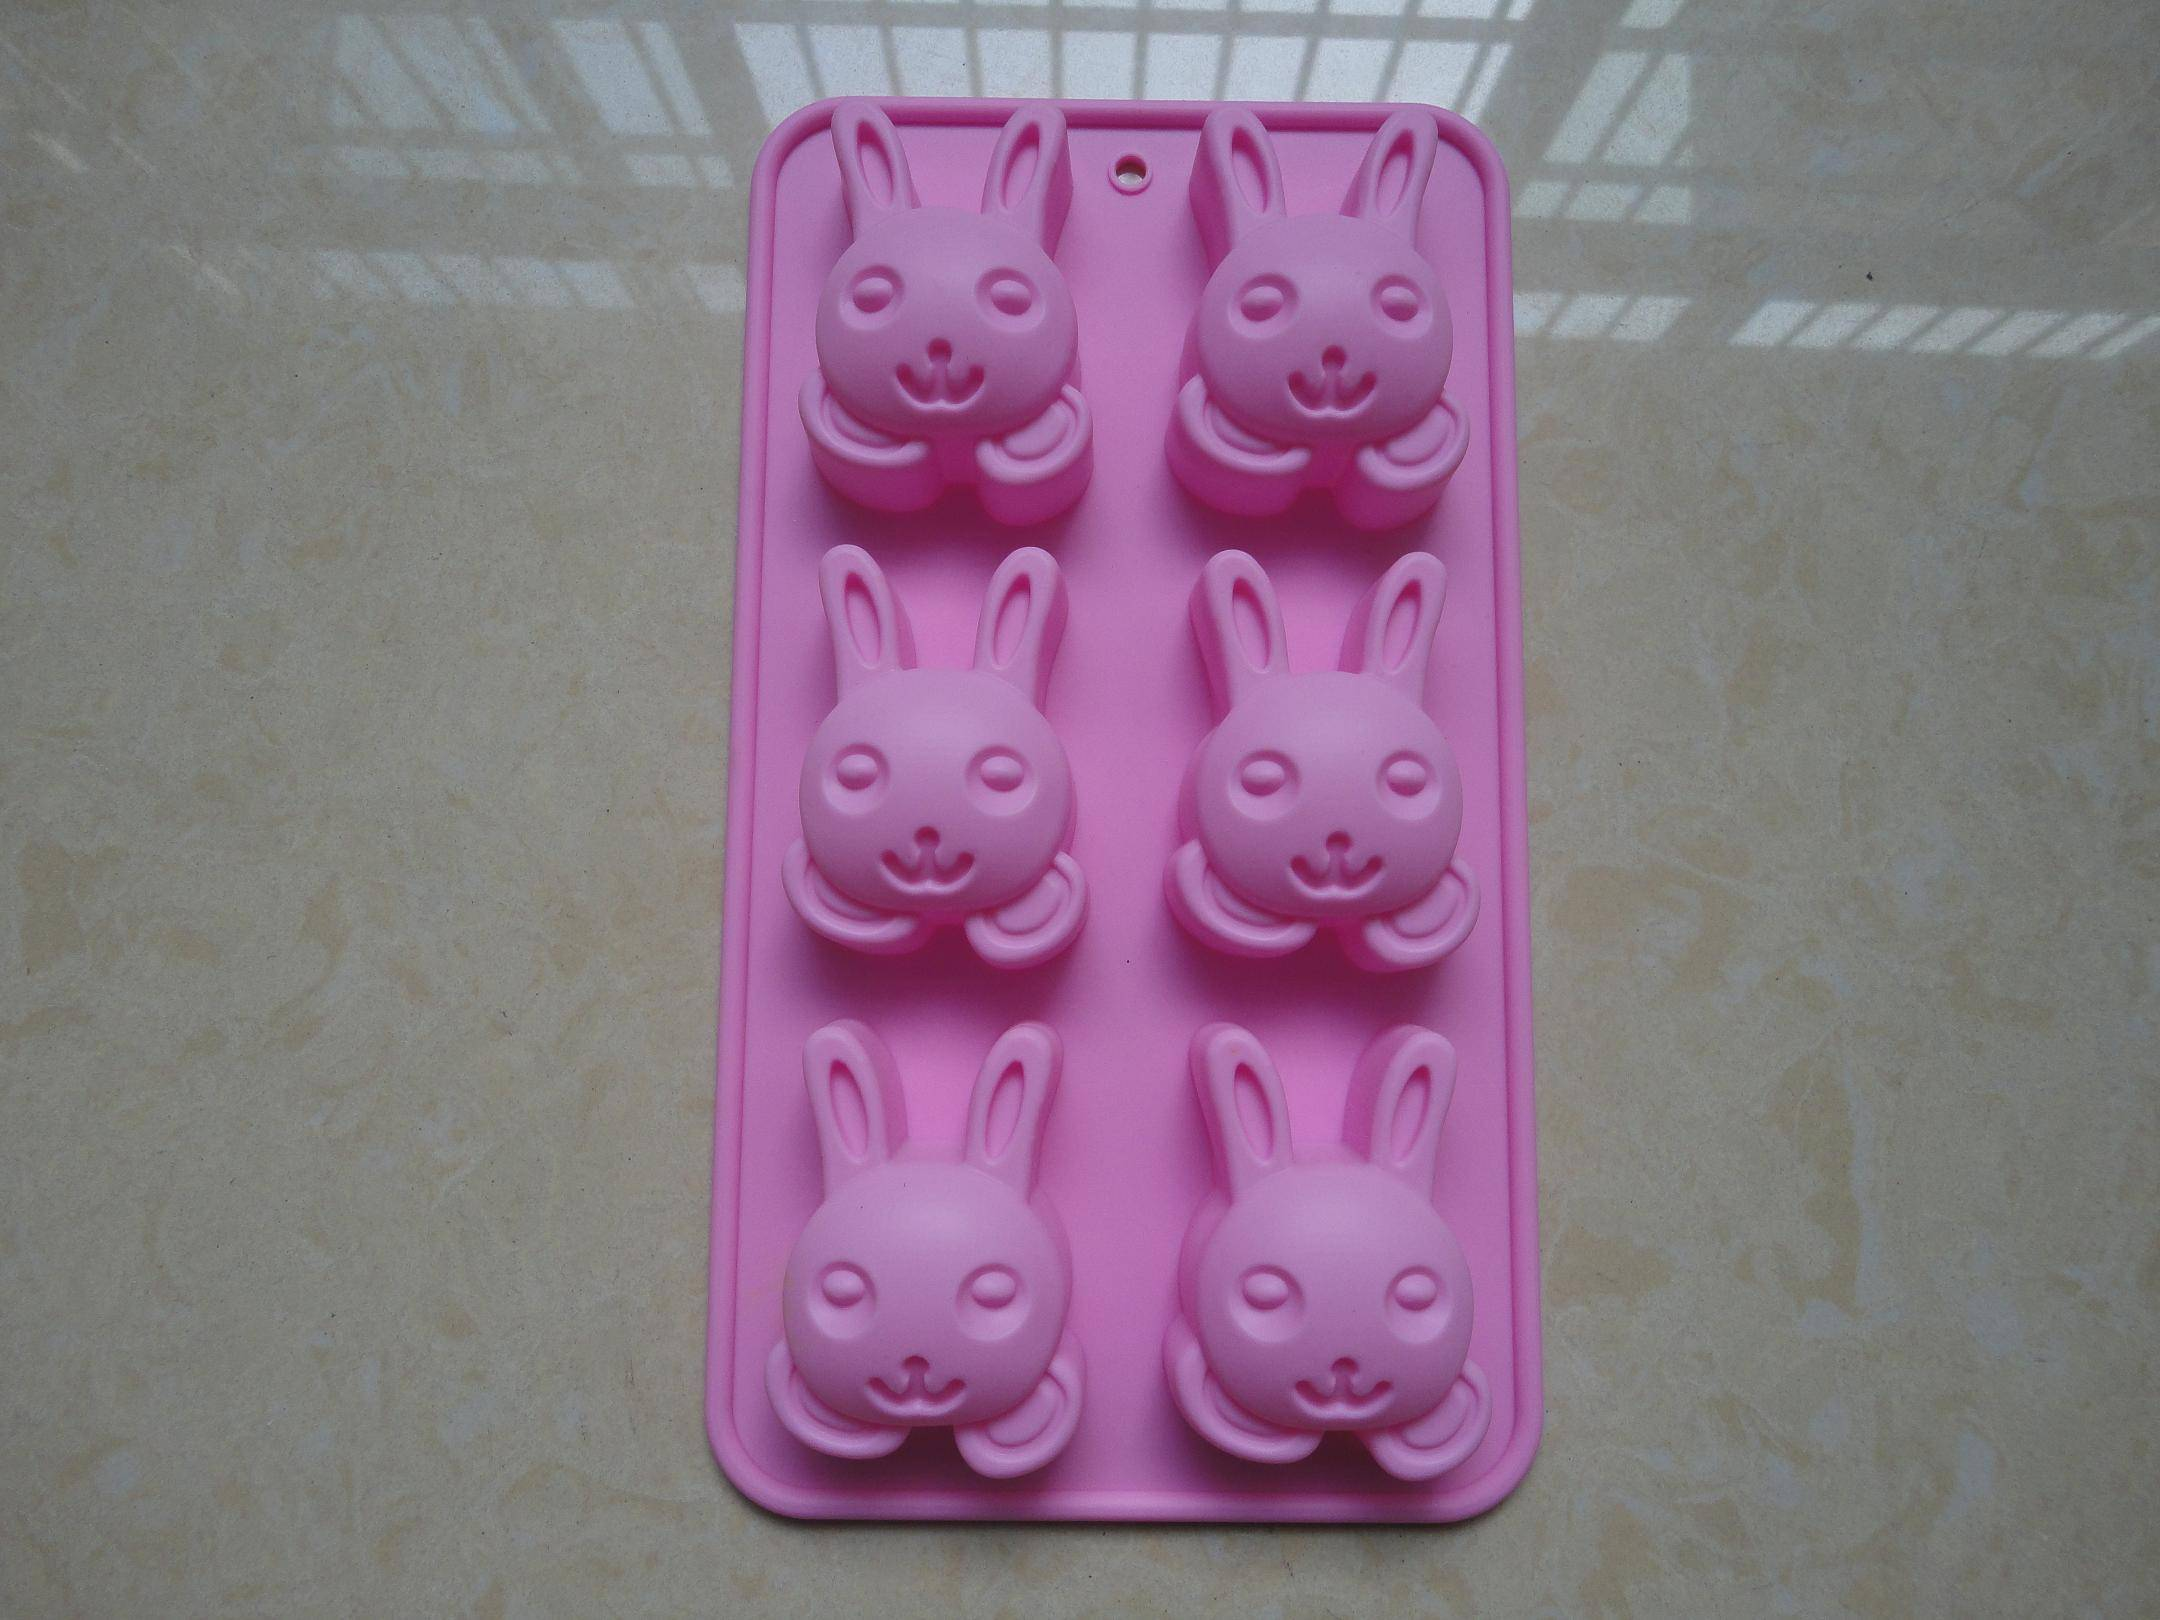 6 cavity FDA / LFGB rabbit shape bakeware silicone cake mold makers